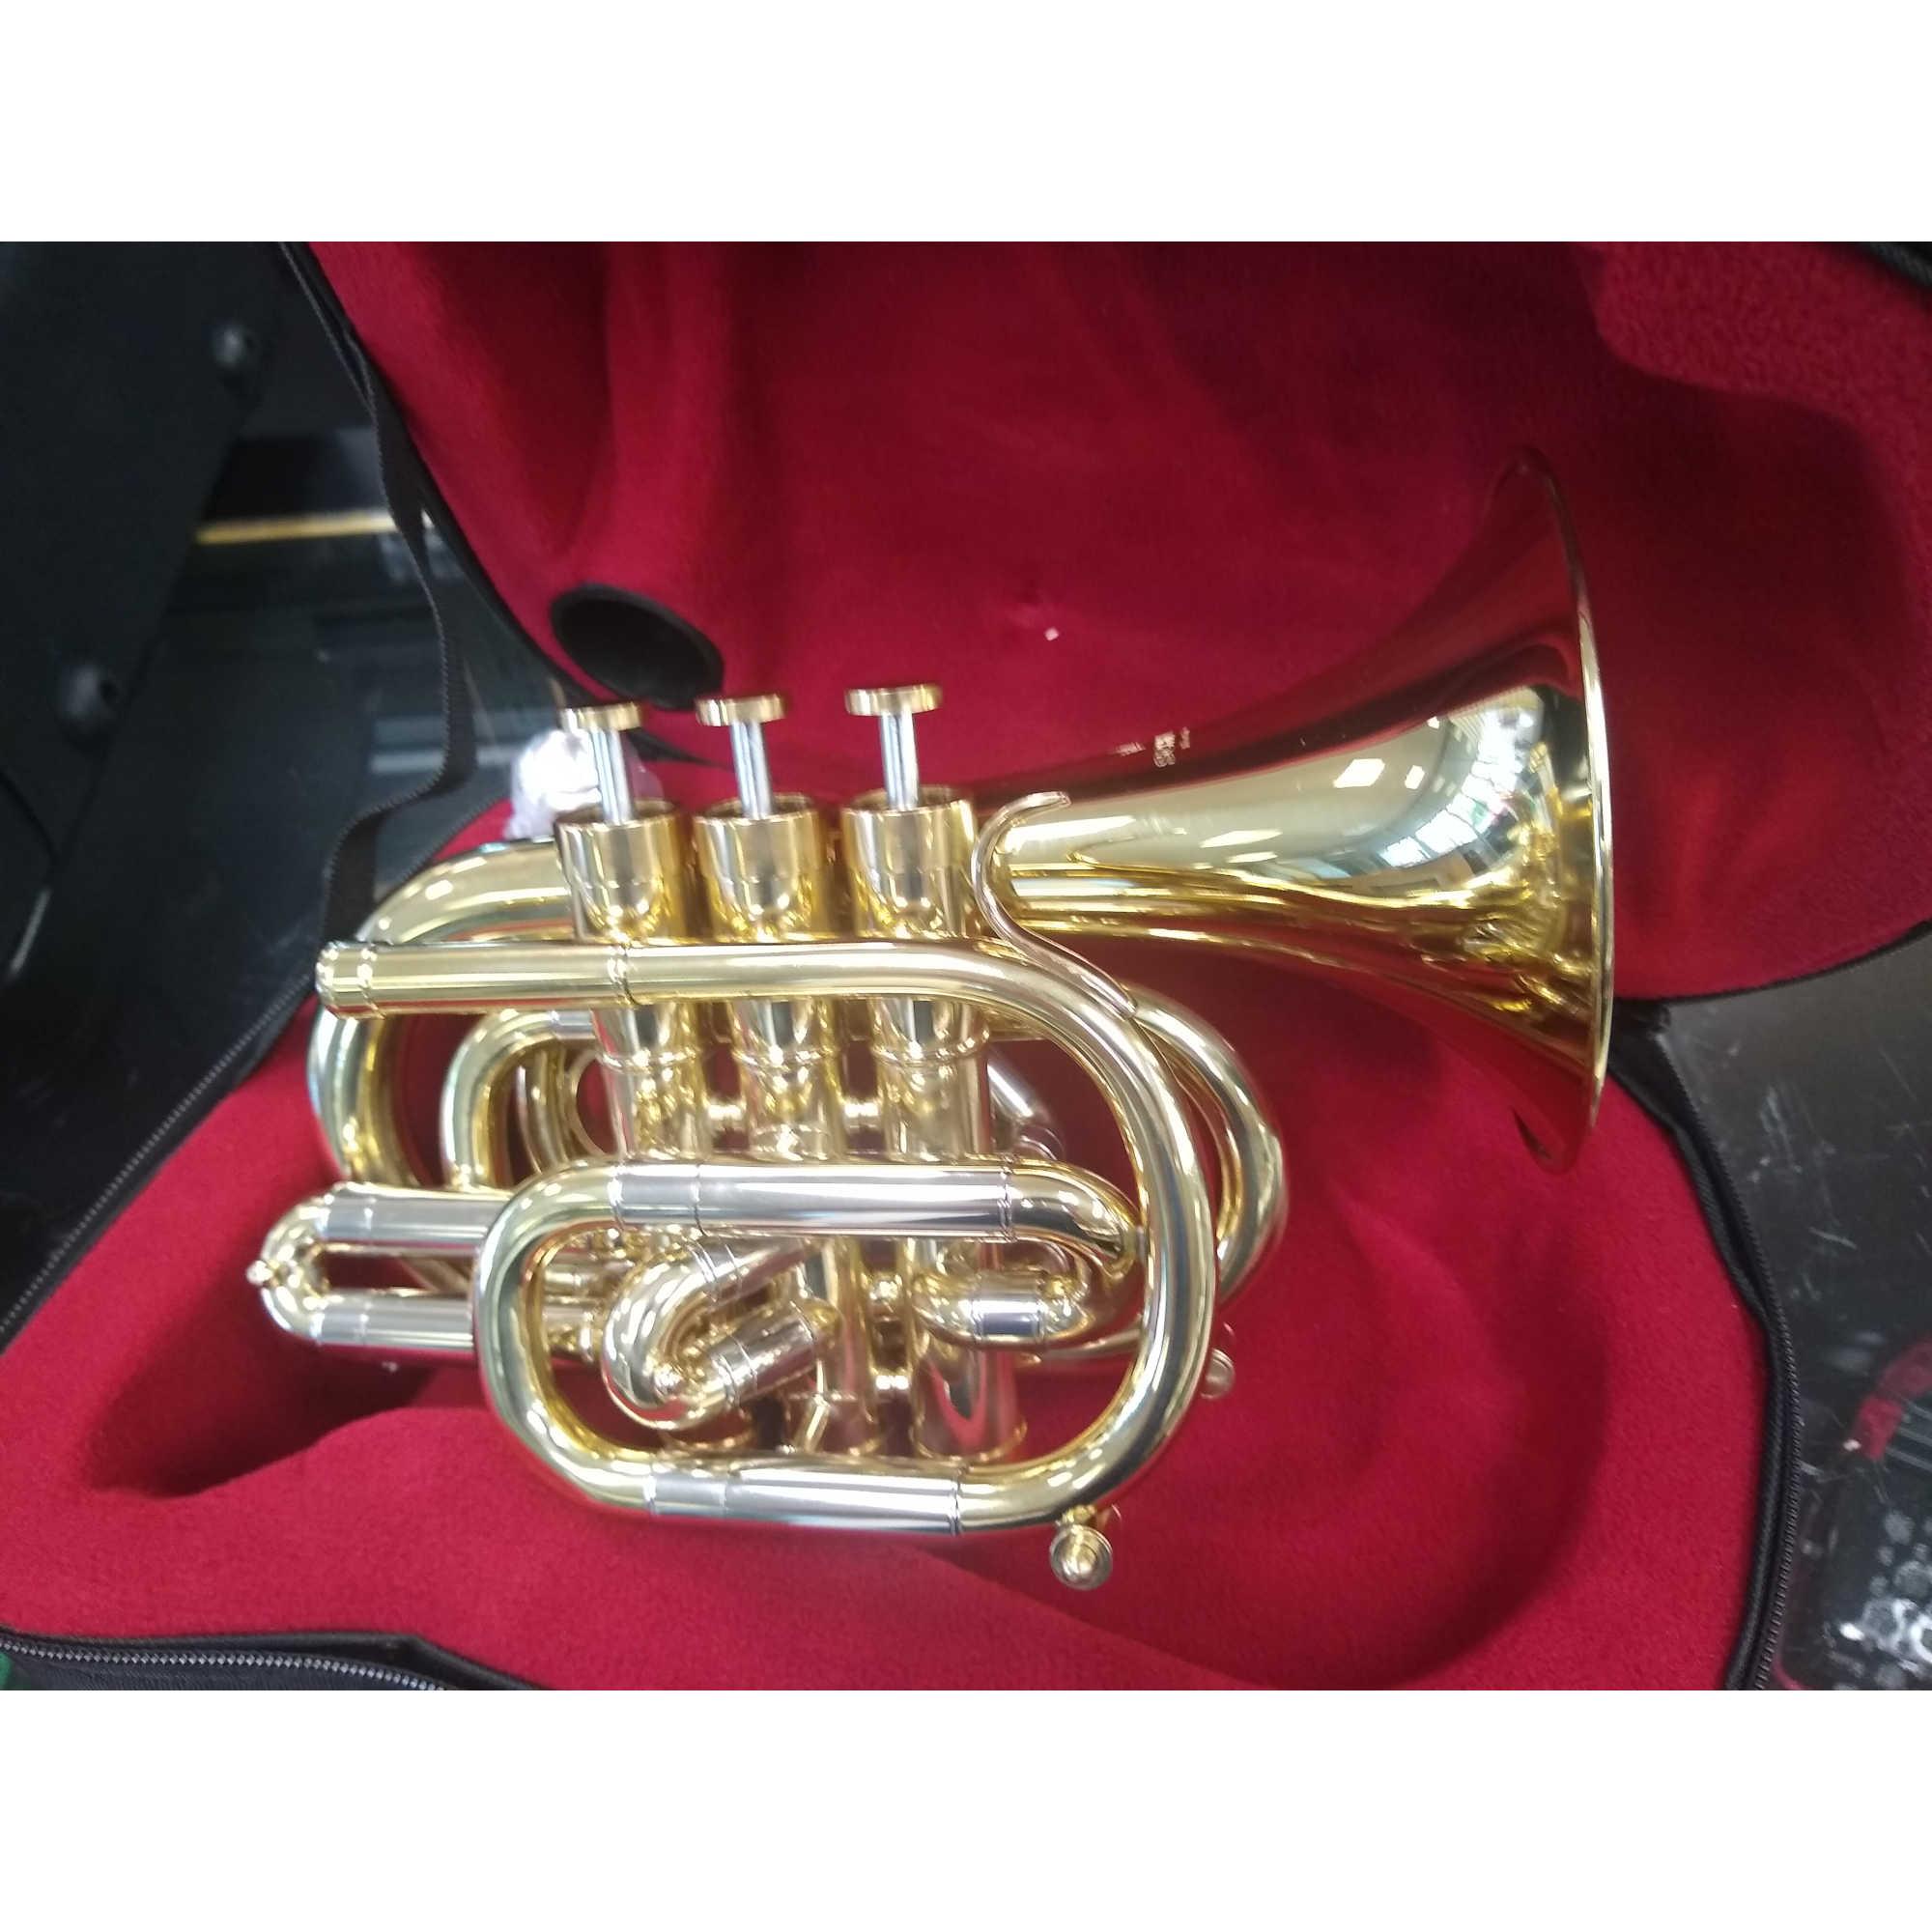 Schiller Centertone Pocket Trumpet Key Of Bb - Gold Lacquer